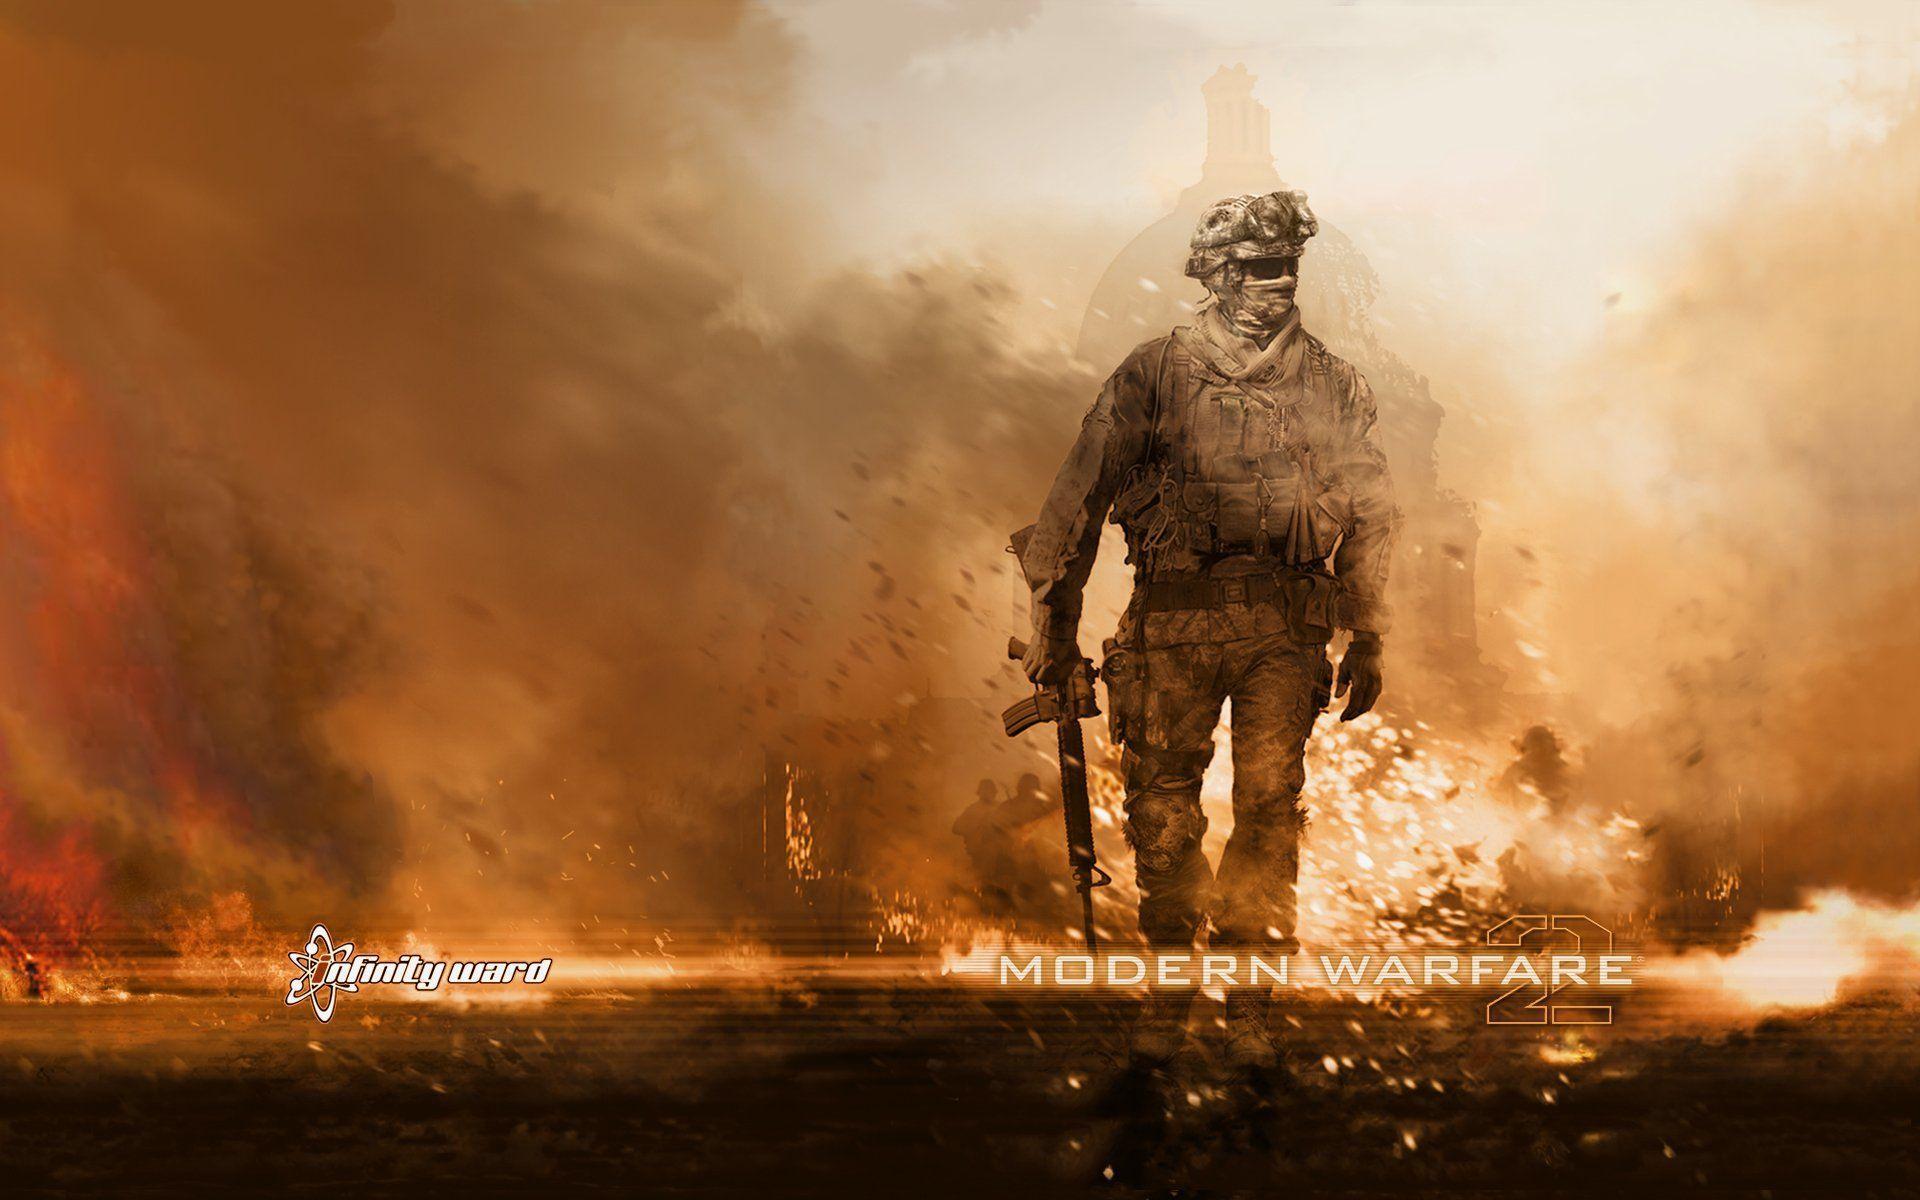 Call Of Duty Modern Warfare 2 Wallpapers Wallpaper Cave